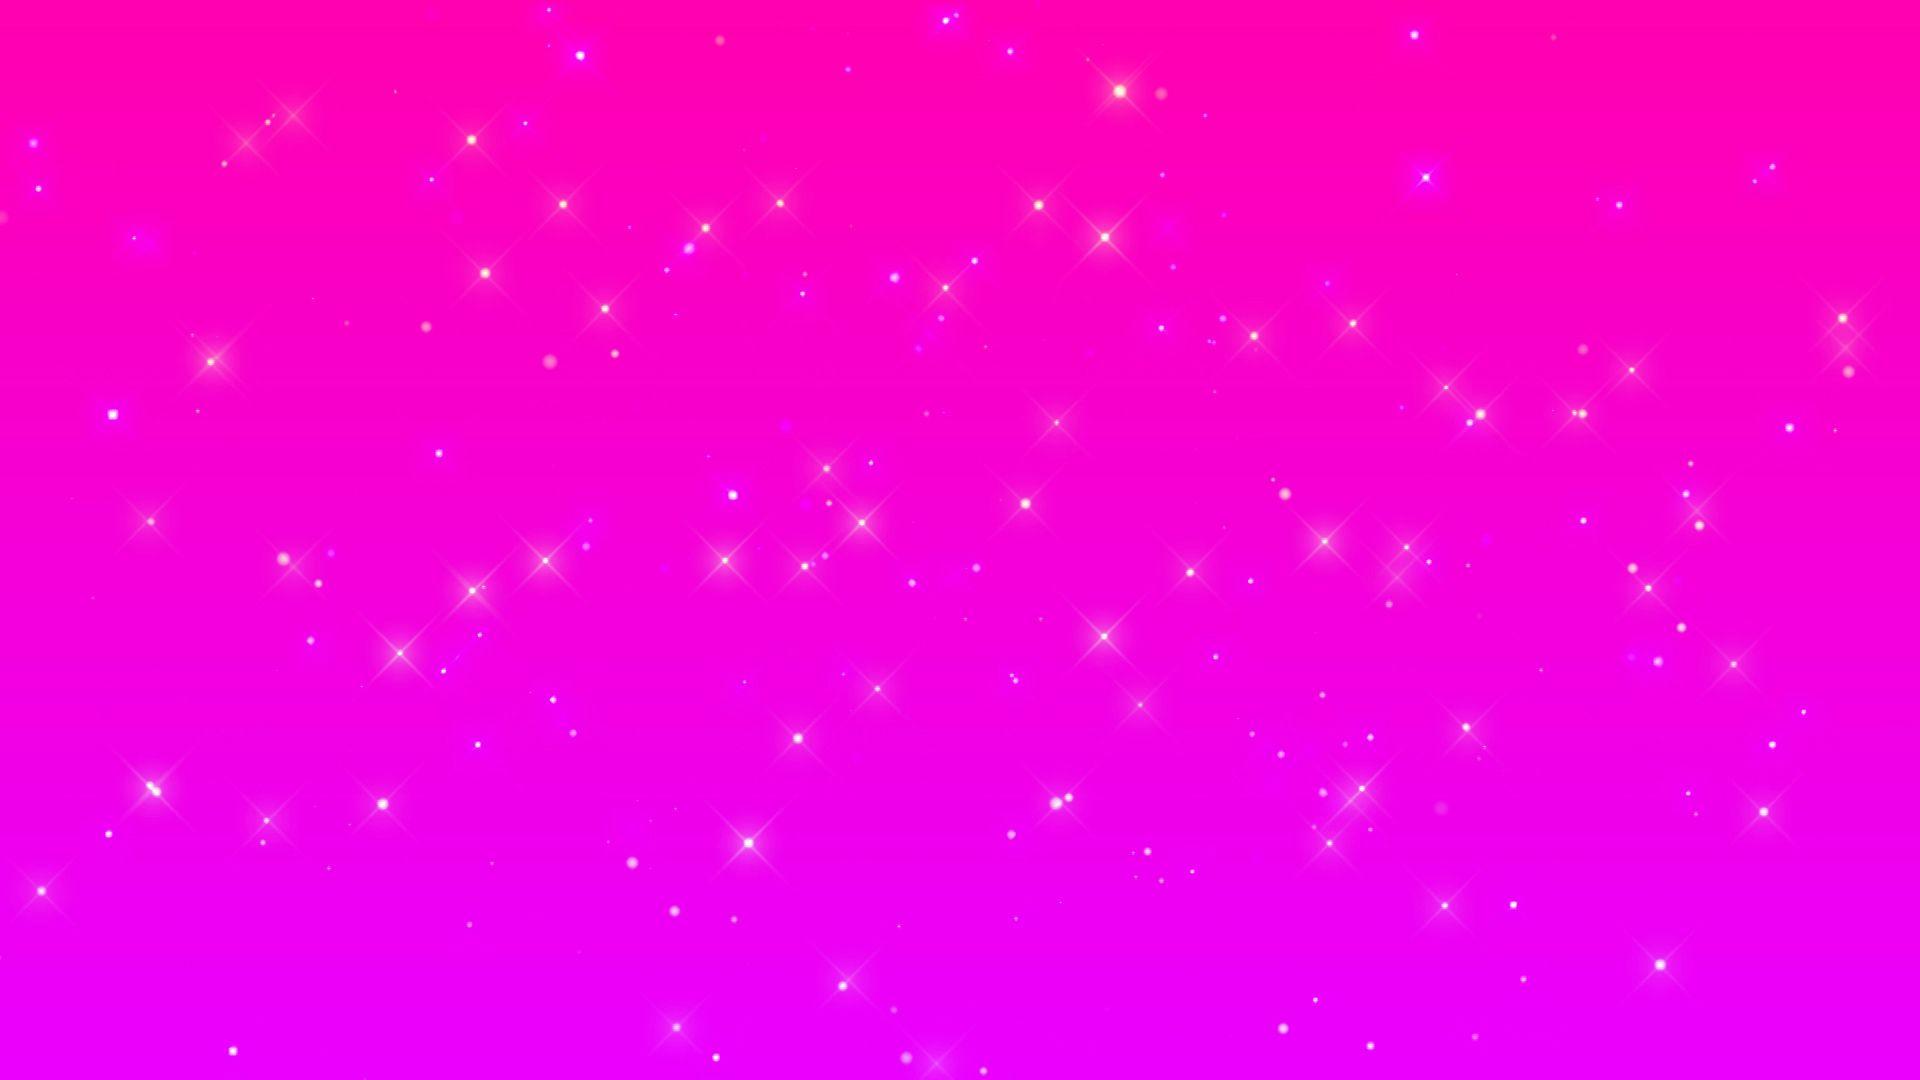 Plain Pastel Pink Background 1000x1000 Wallpaper 30 Wallpapers